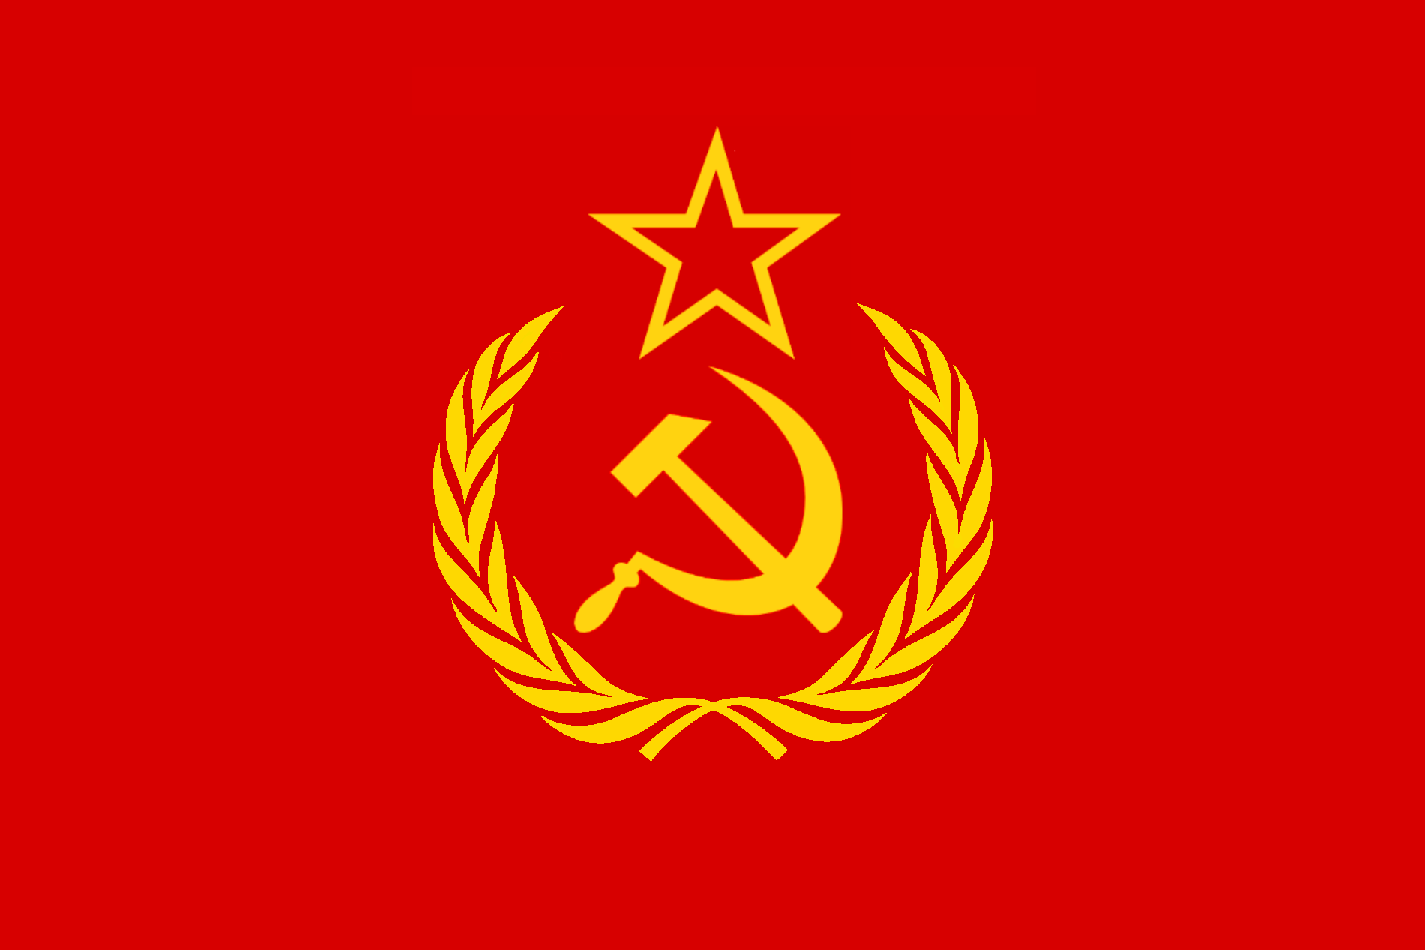 HQ Flag Of United Soviet Socialist Republics Wallpapers | File 43.81Kb